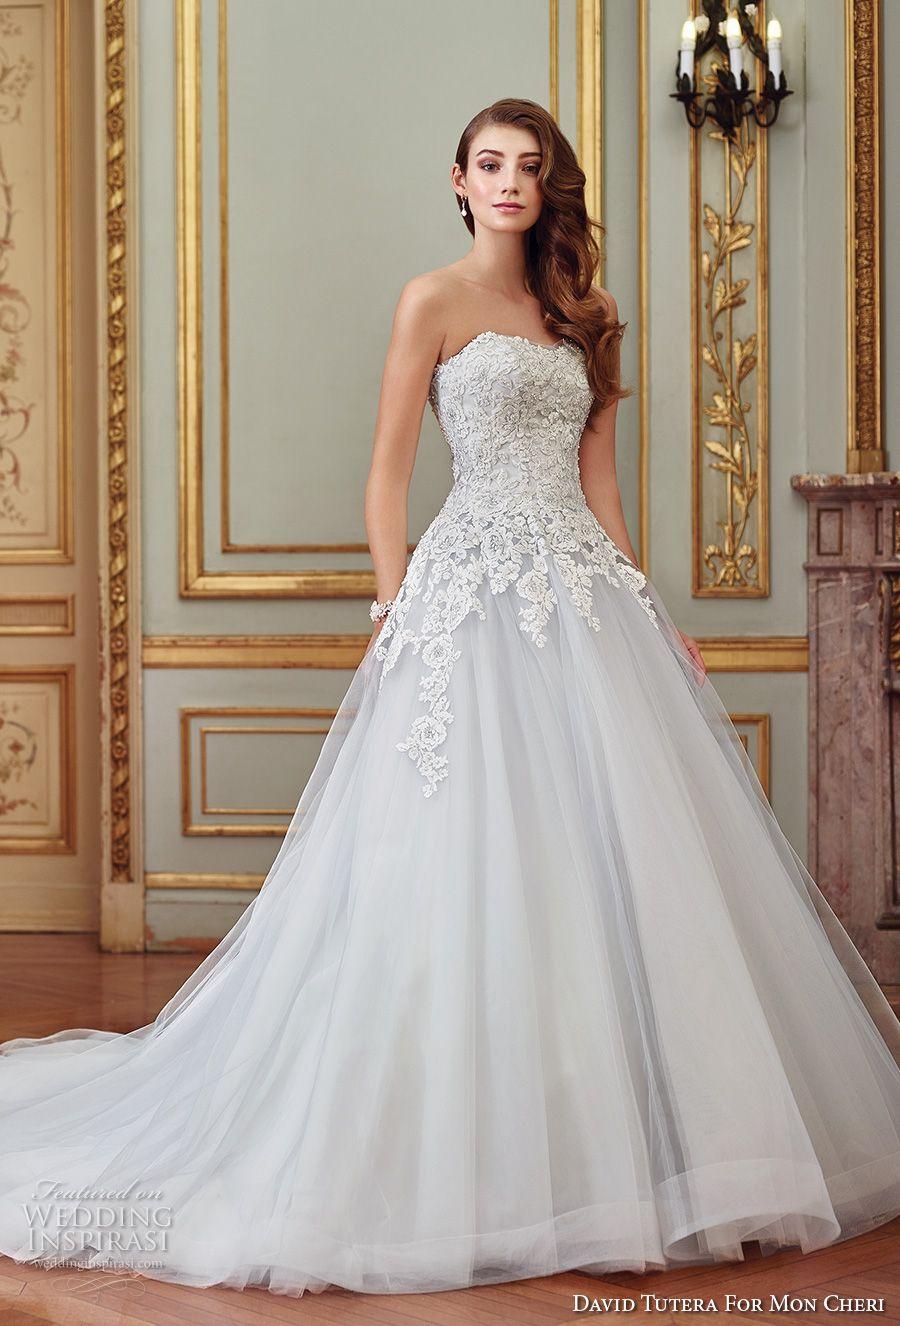 David Tutera For Mon Cheri Spring 2017 Wedding Dresses Wedding Inspirasi Wedding Dresses Ball Gowns Wedding Aline Wedding Dress [ 1326 x 900 Pixel ]